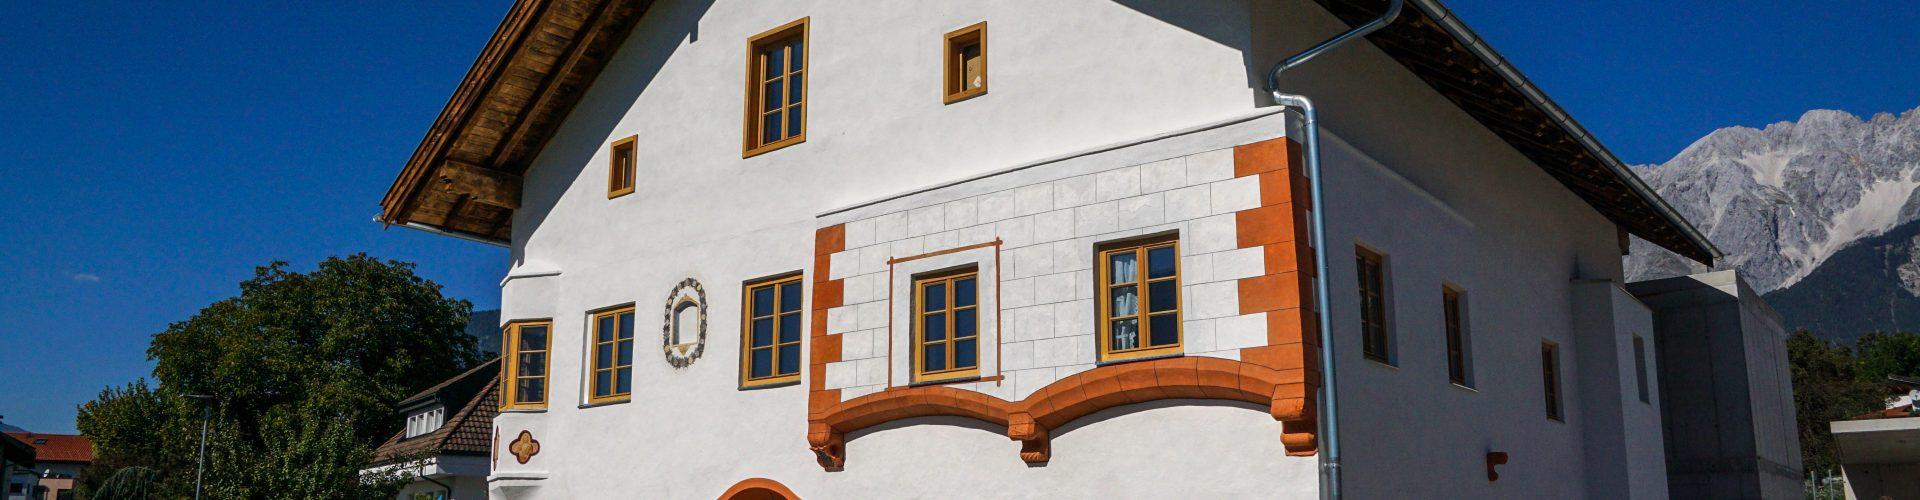 Frühmesserhaus Untermieming Foto: Andreas Fischer